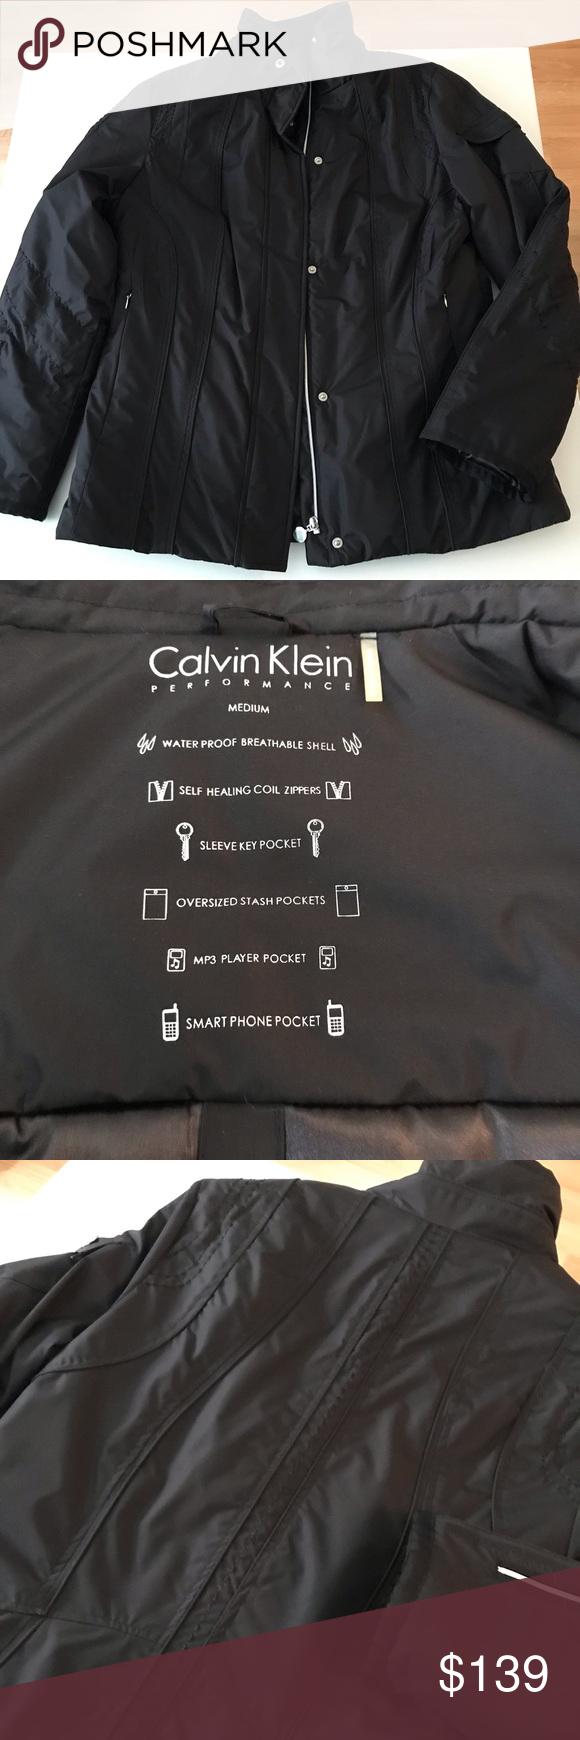 Nwot Calvin Klein Performance Puffer Jacket Coat Calvin Clothes Design Calvin Klein [ 1740 x 580 Pixel ]